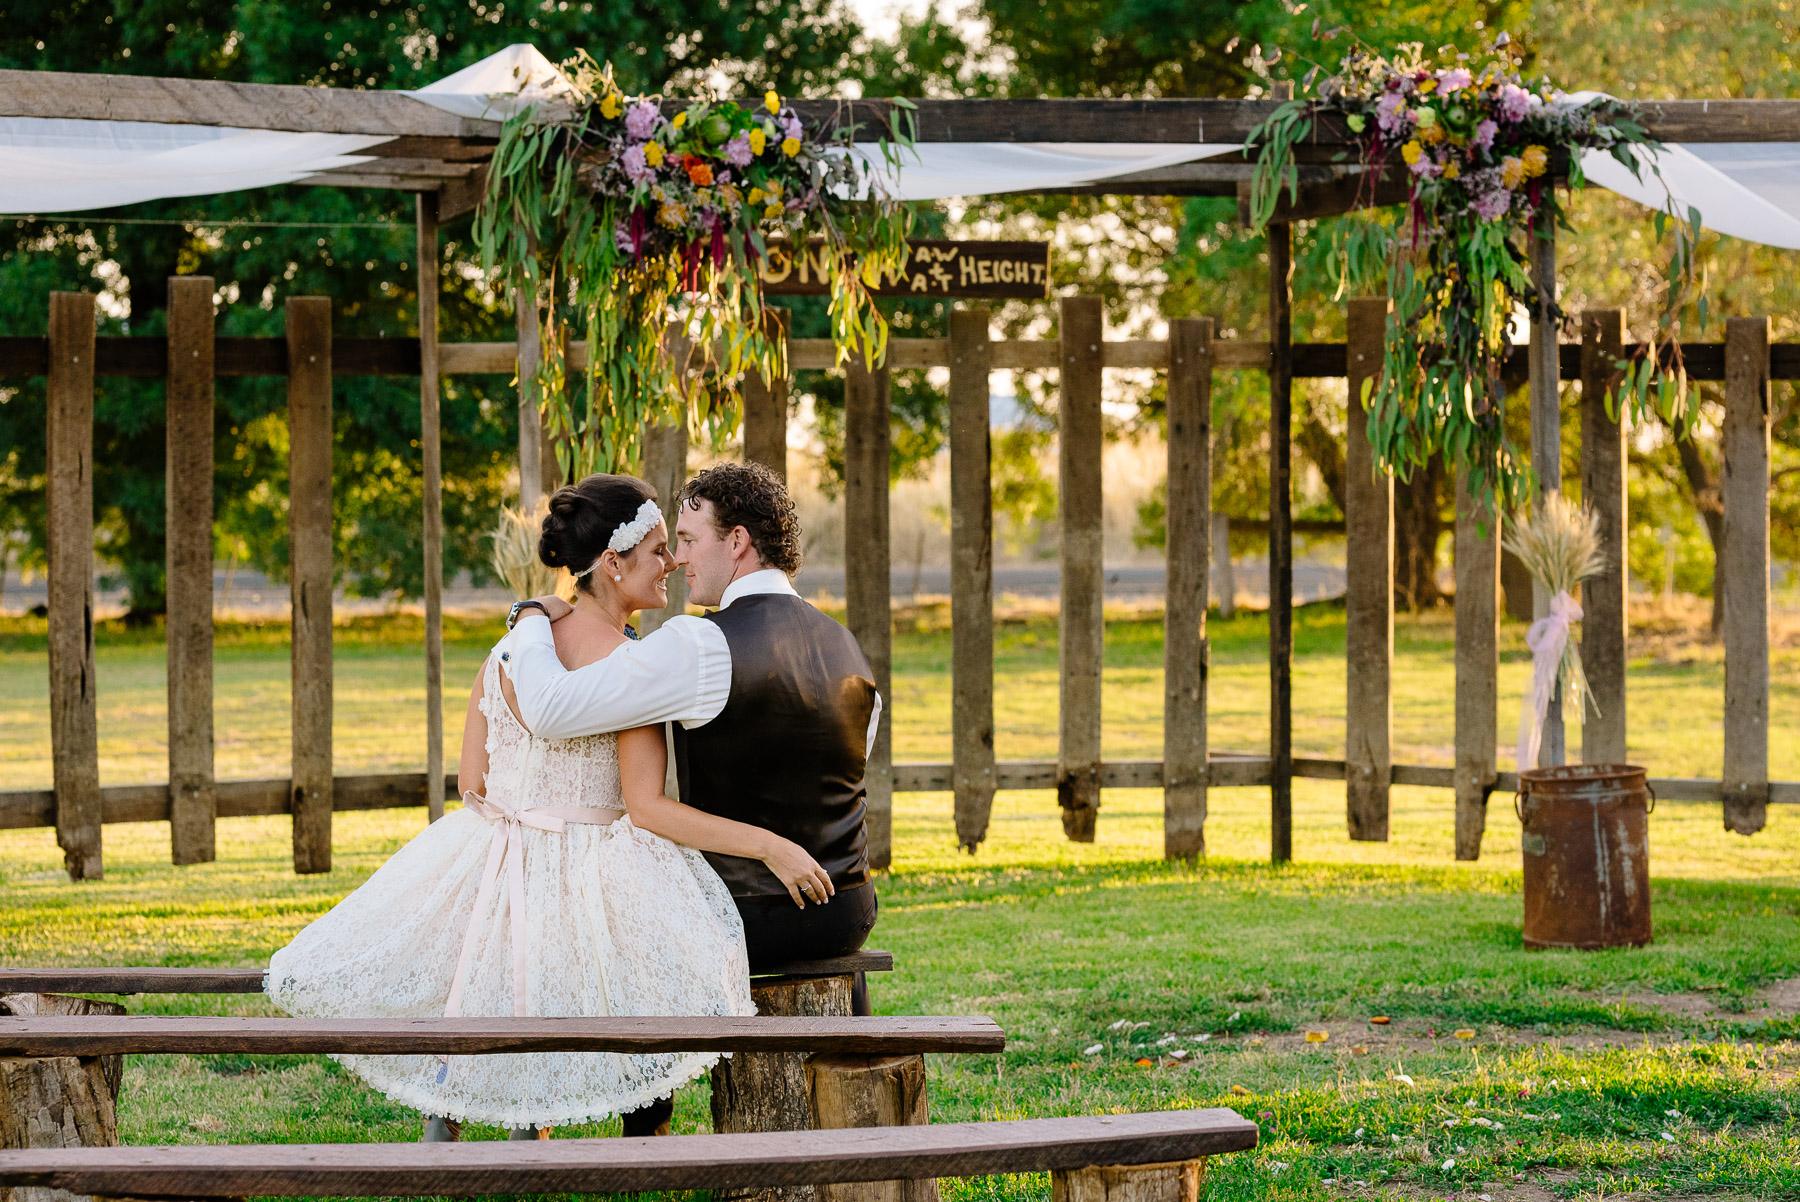 Melissa_and_Kristan_Echuca_Farm_Wedding_New_Years_Eve-103.jpg